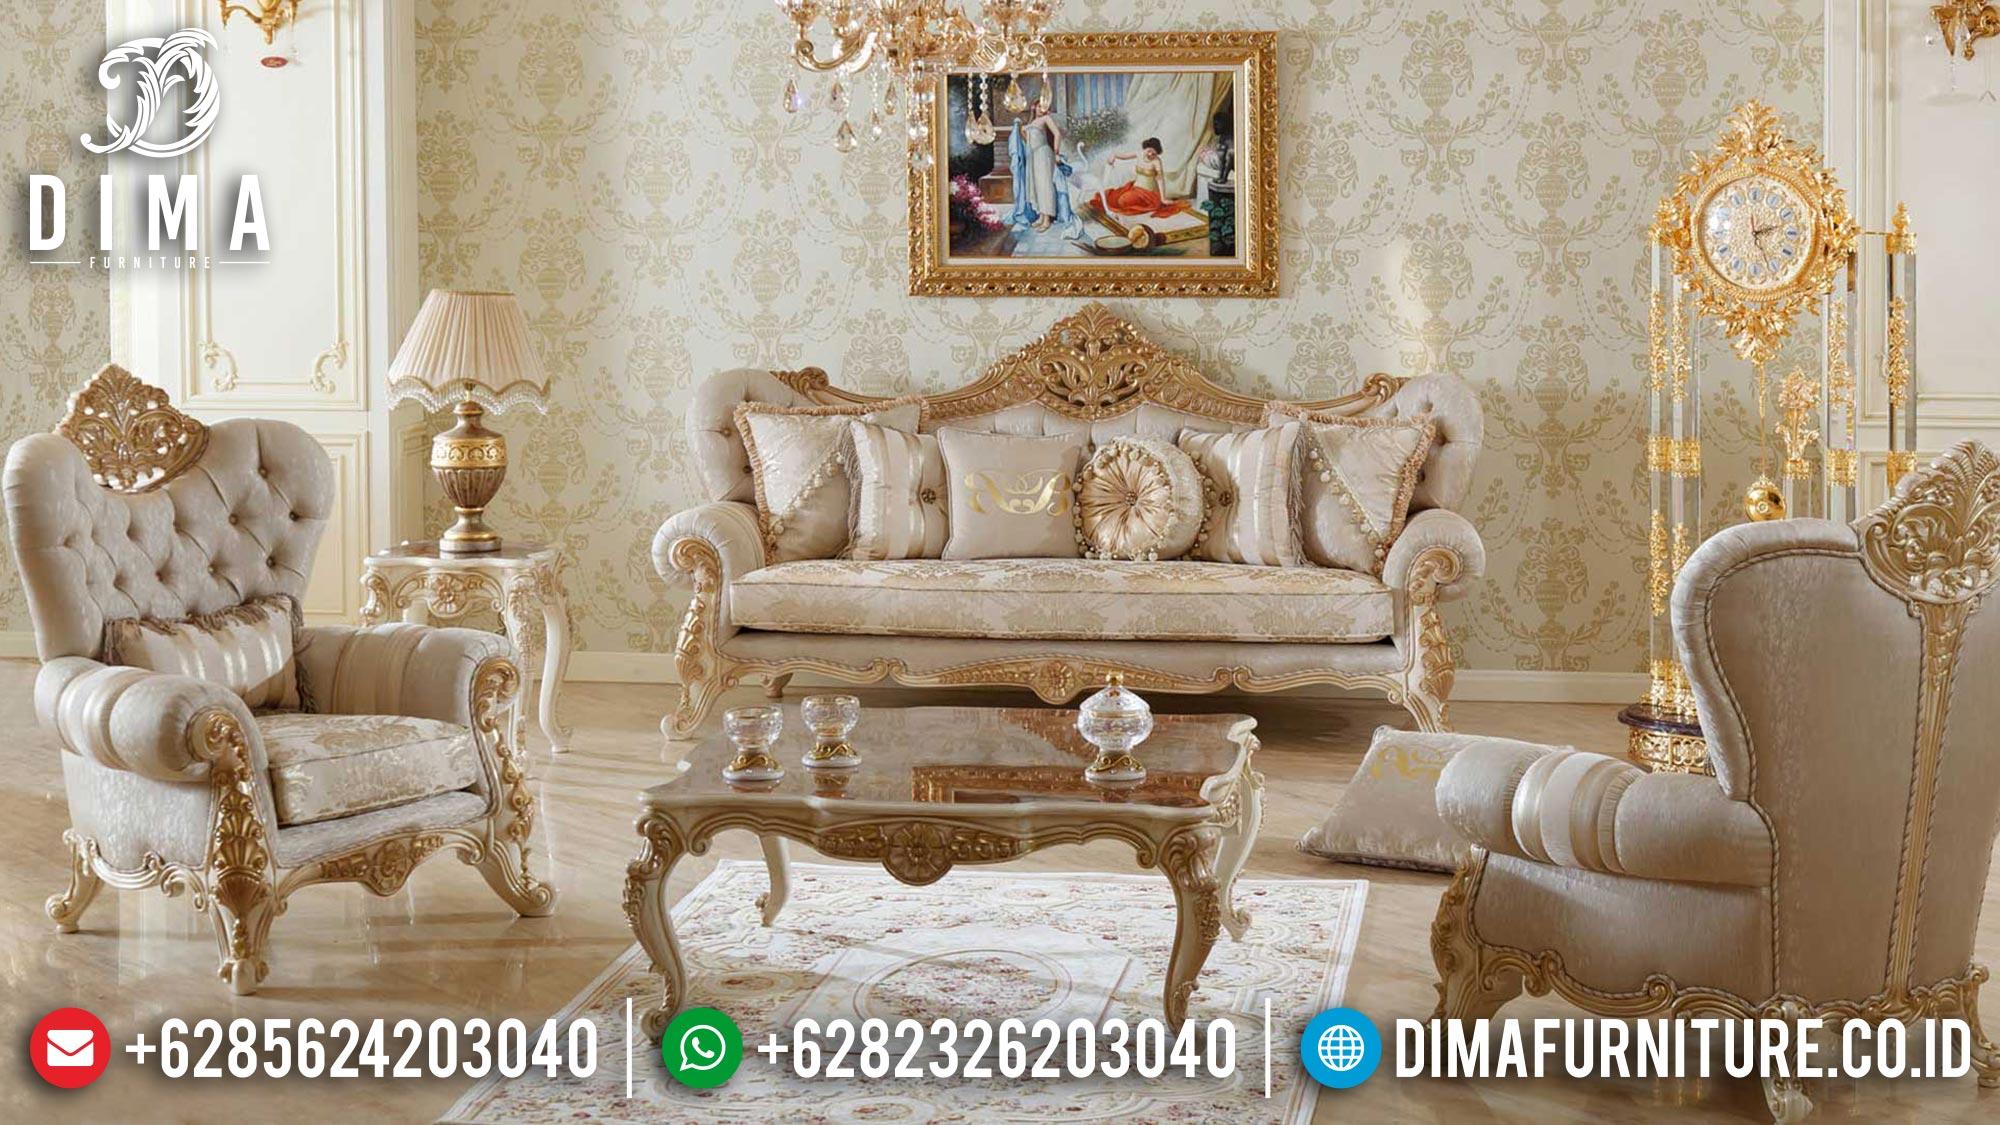 Sofa Tamu Jepara Terbaru Duco Ivory Gold New 2021 Df-1472